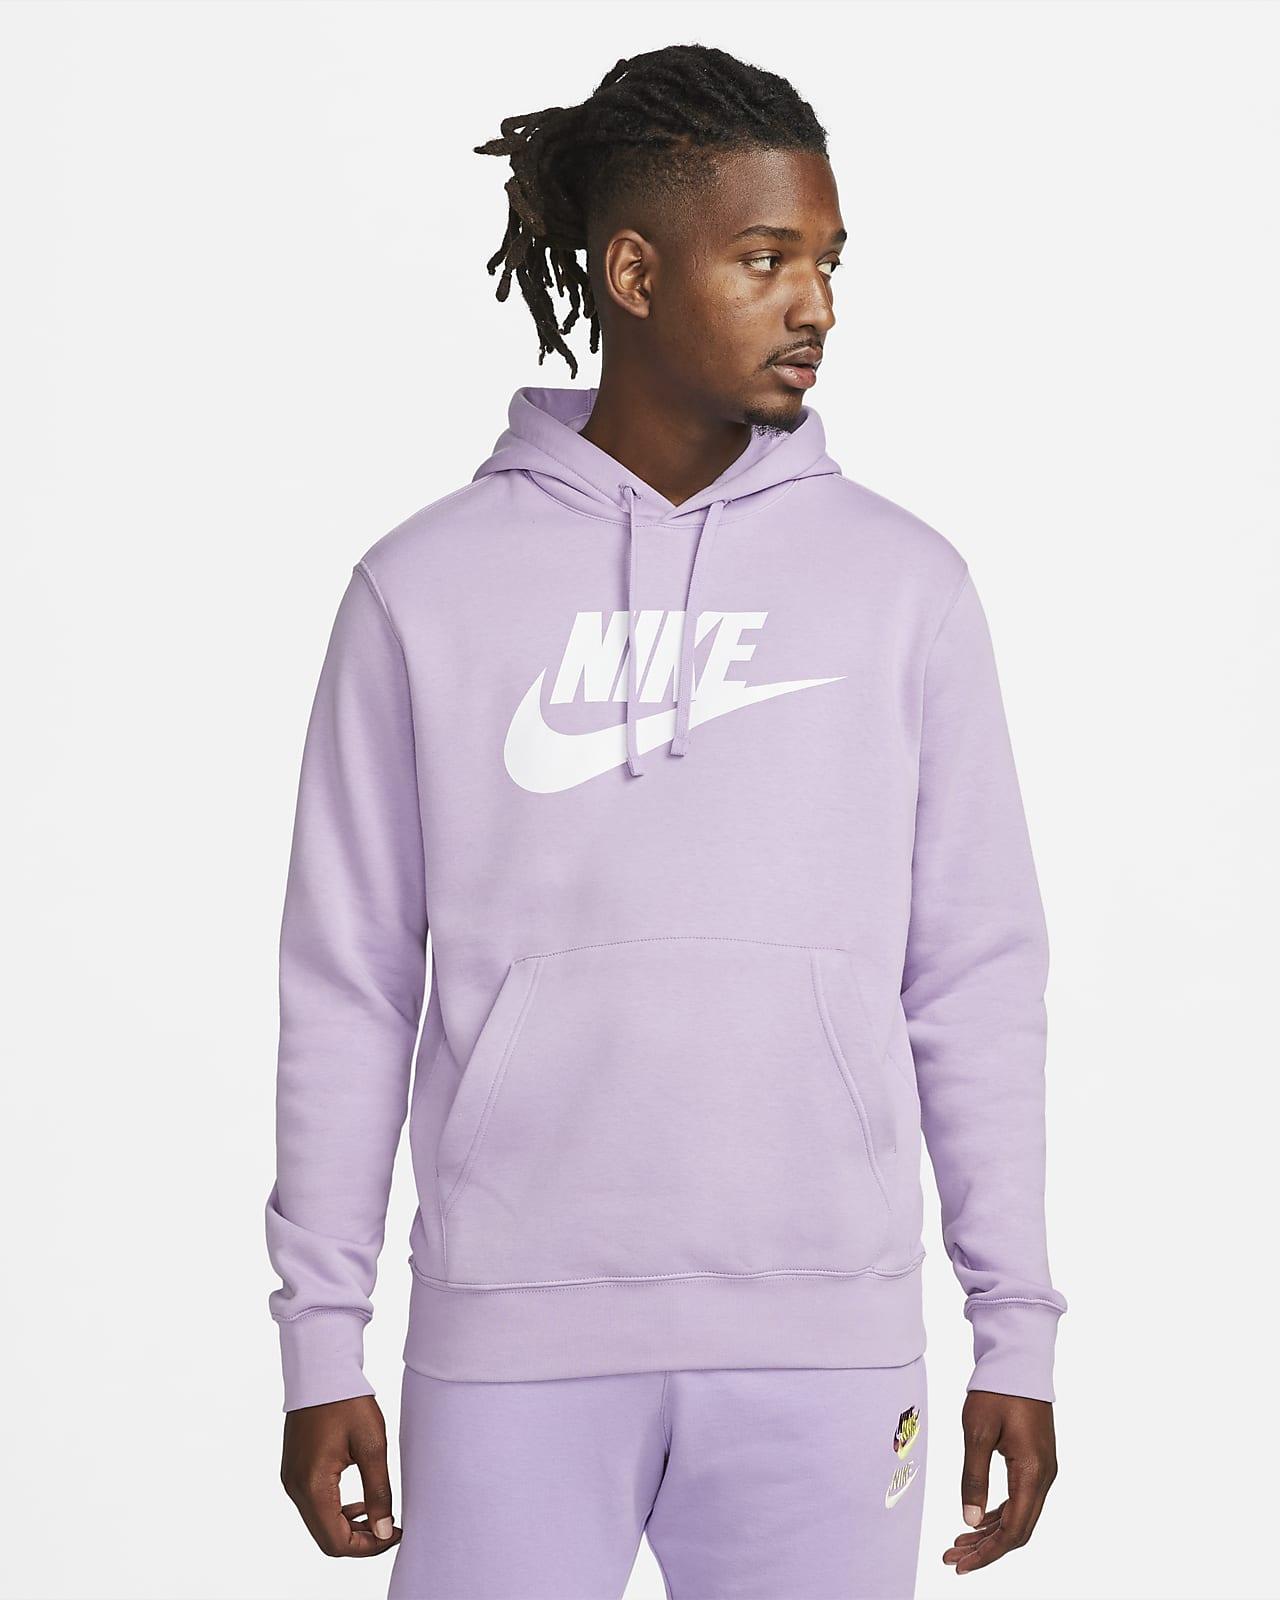 Мужская худи с графикой Nike Sportswear Club Fleece